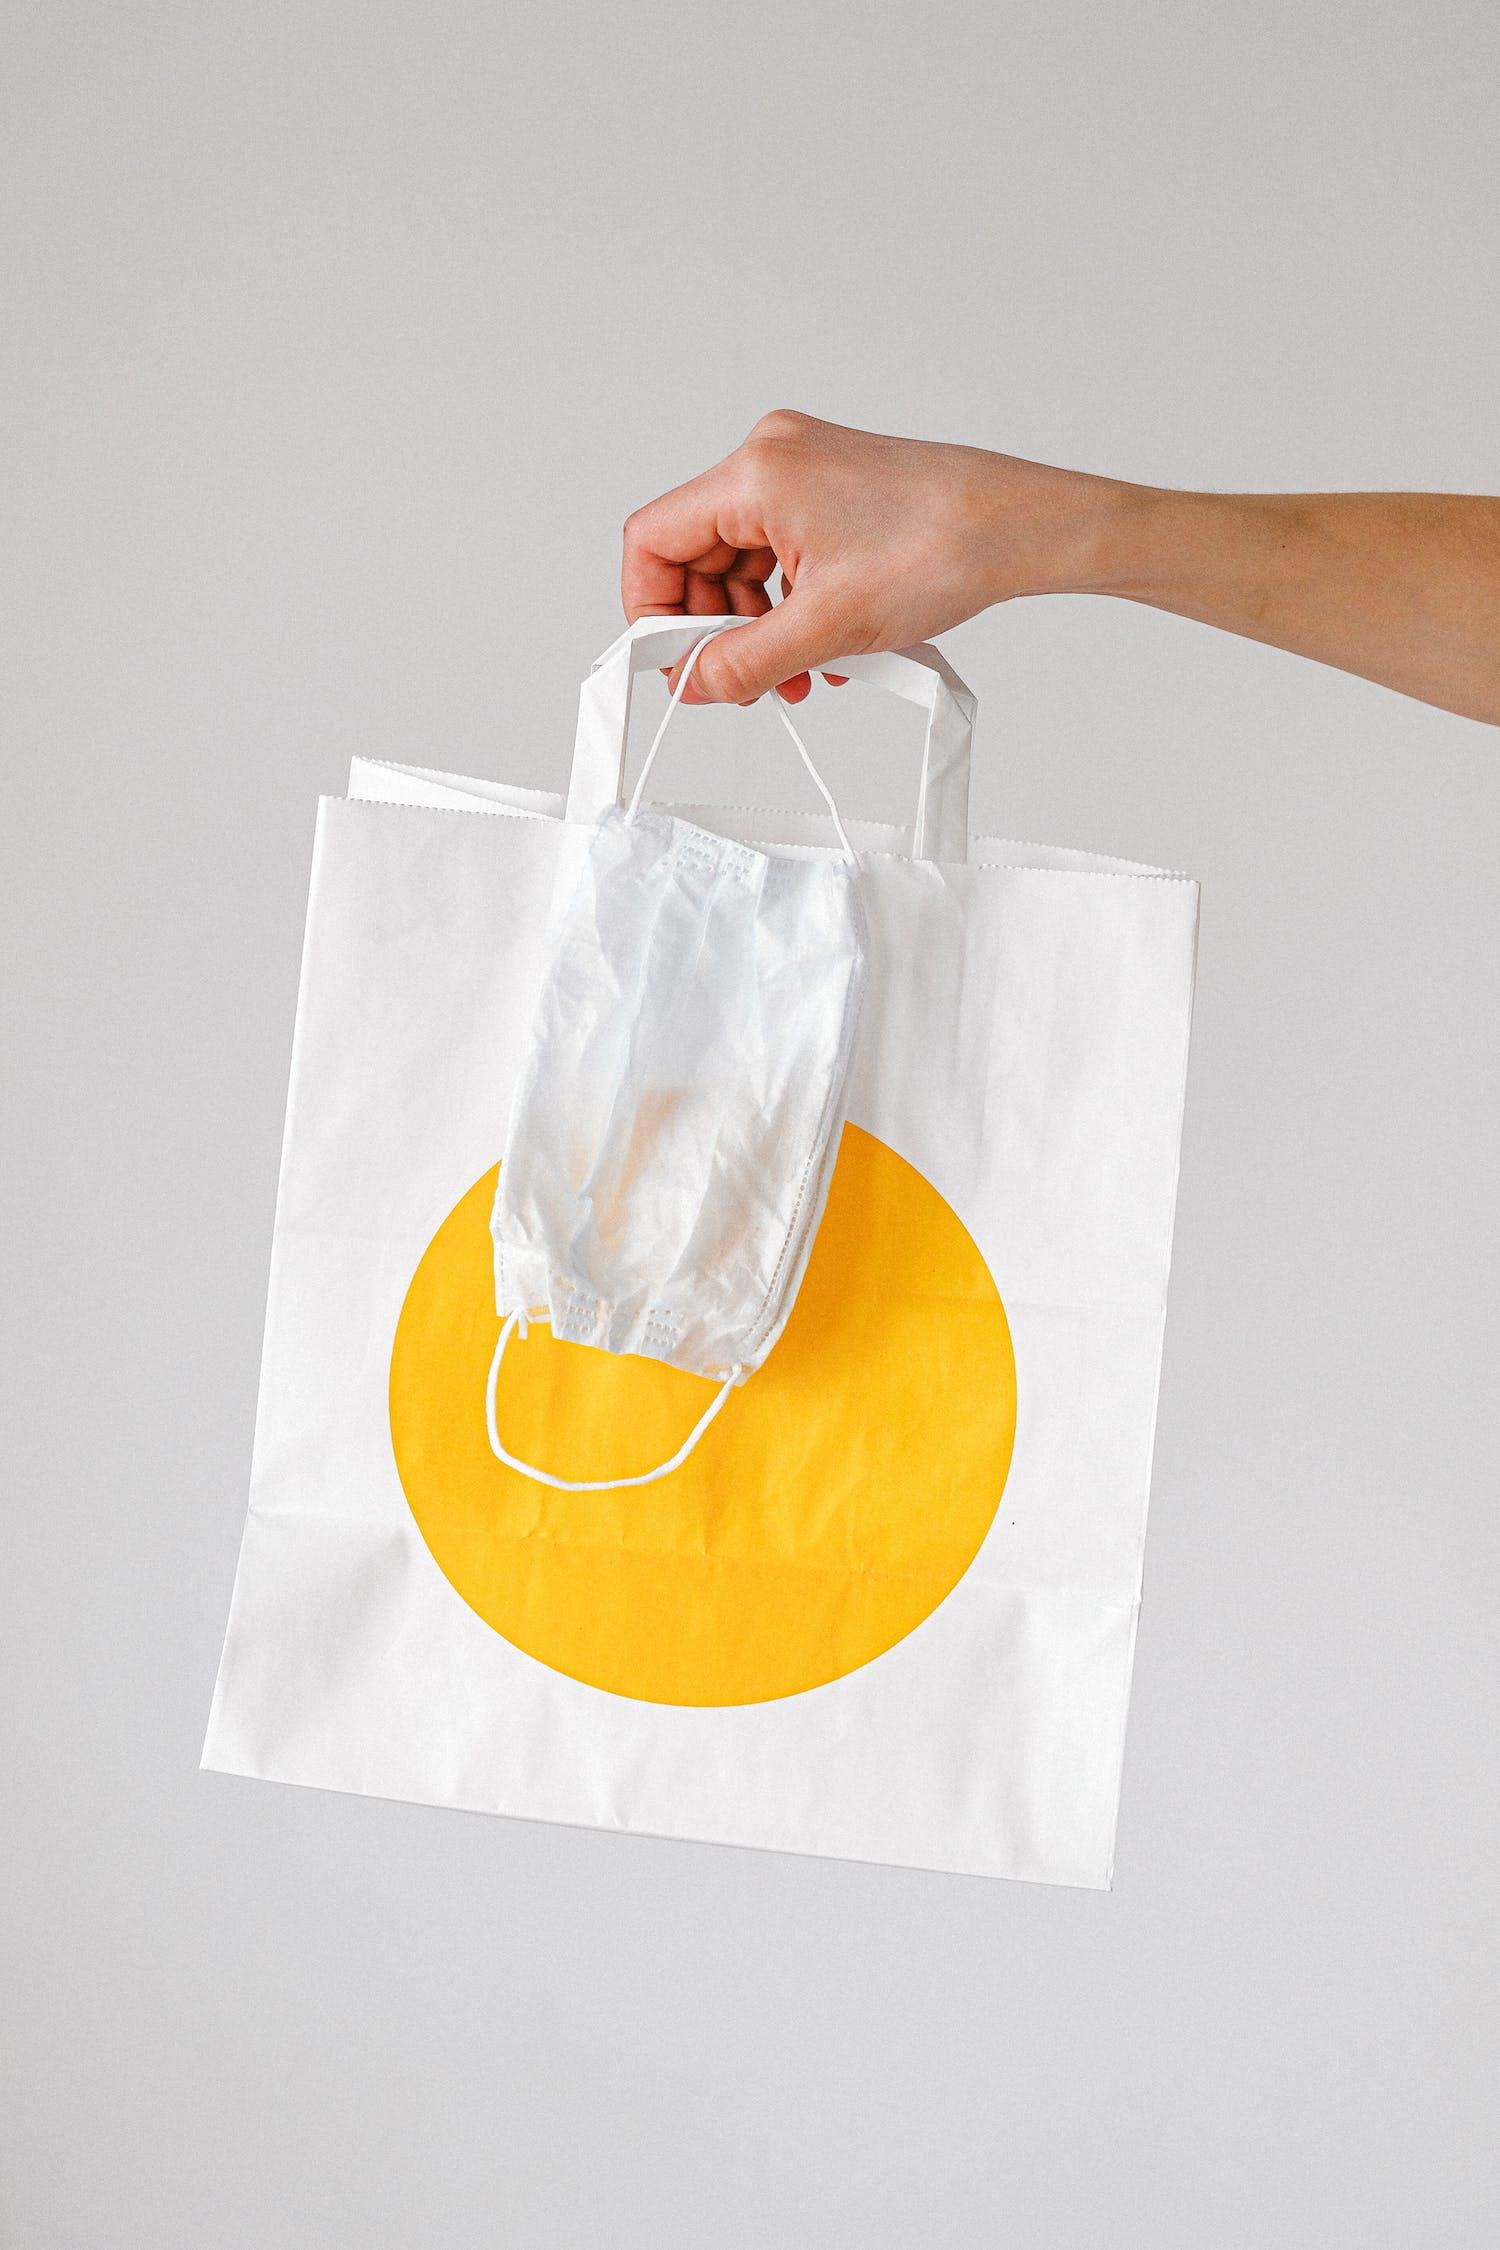 Shopping while Corona